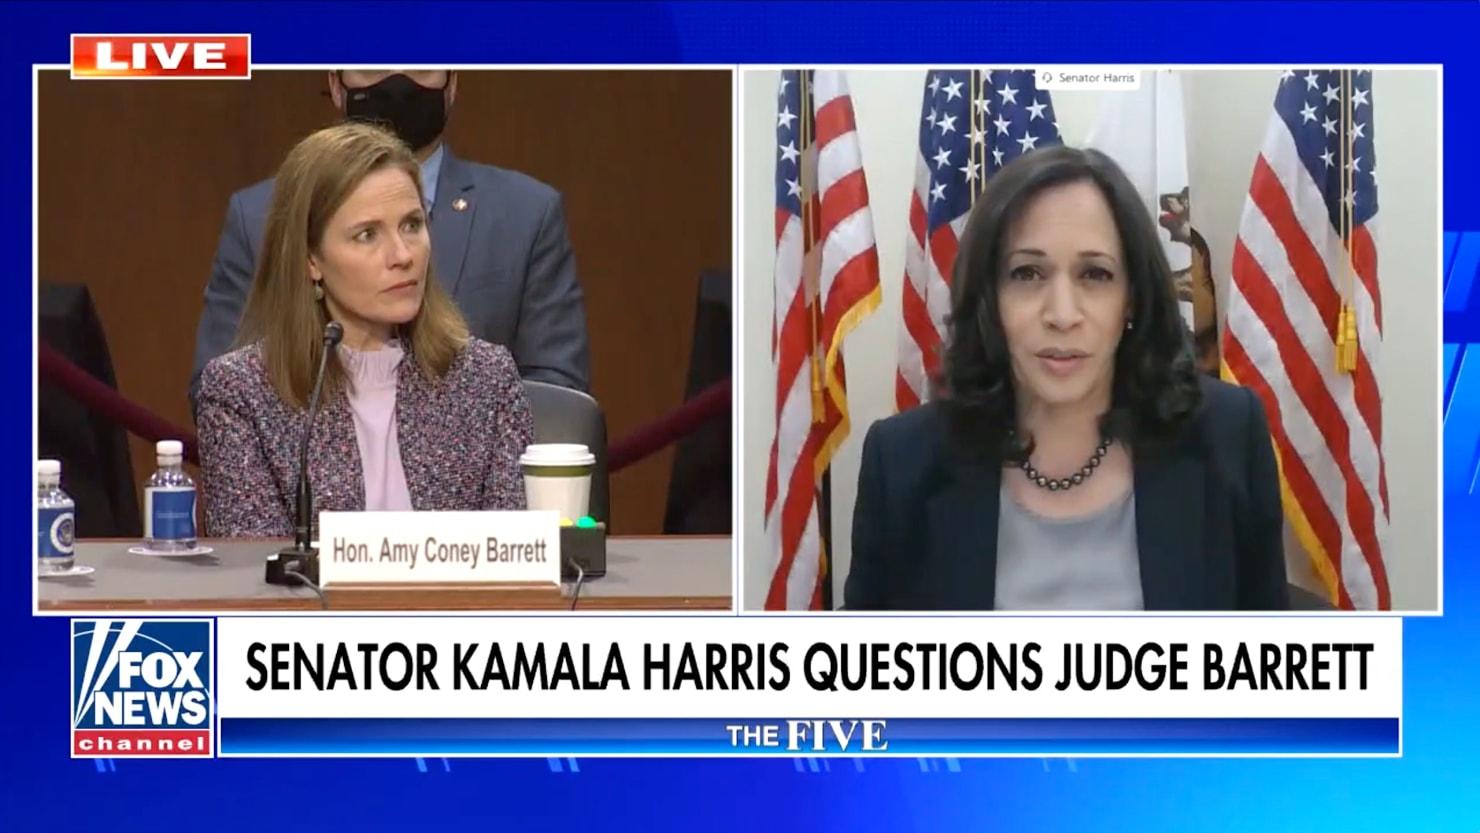 Kamala Harris Gets Barrett to Deny Climate Change Consensus